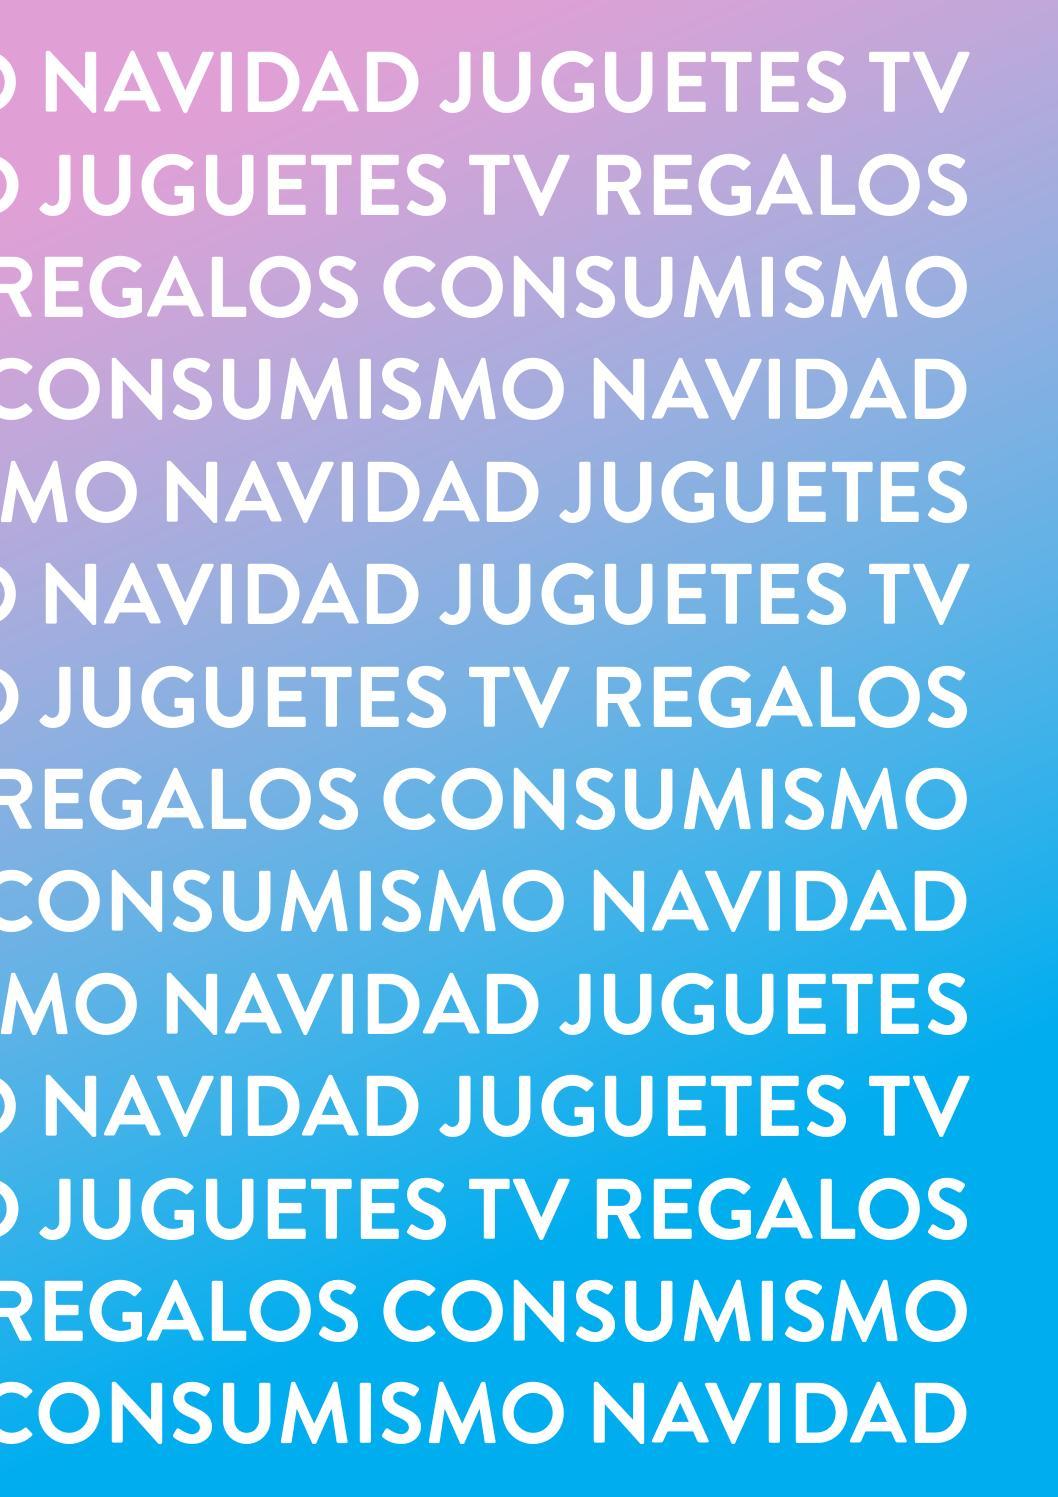 C Tv By Navidad Nil Issuu Juguetes Consumismo Regalos OvNnm80w